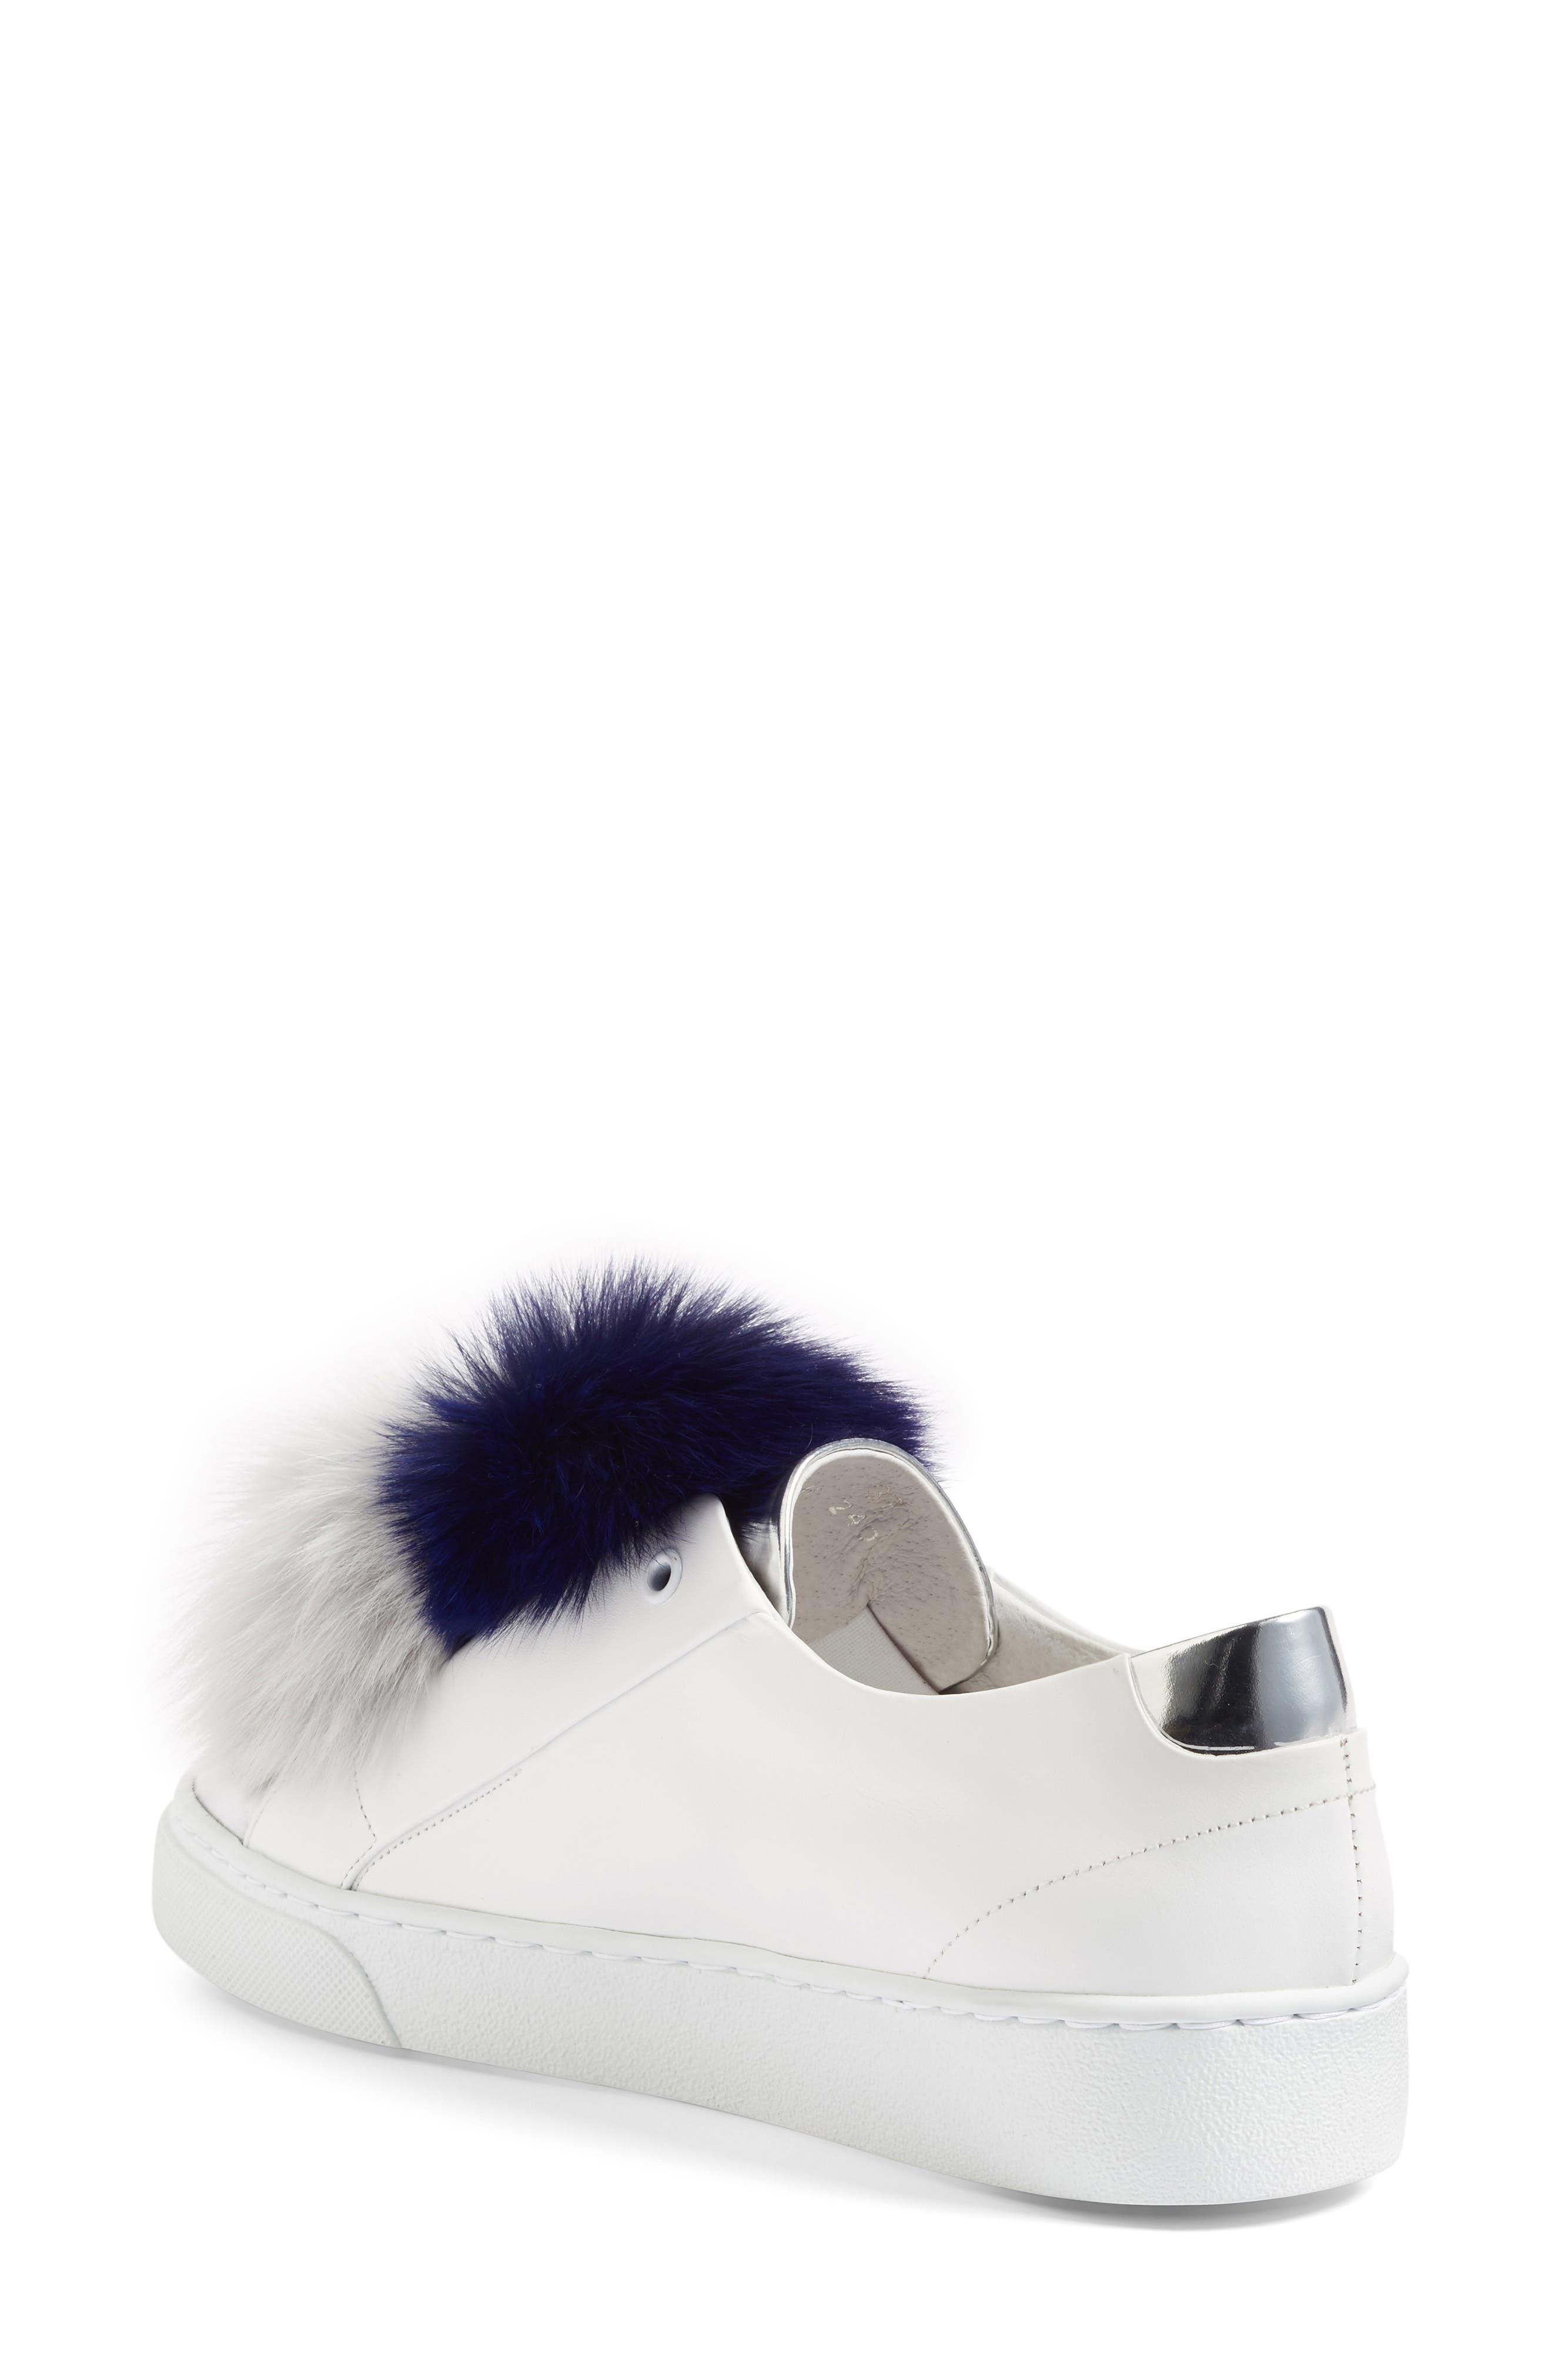 Arian Genuine Fox Fur Trim Sneaker,                             Alternate thumbnail 2, color,                             White Leather/ Navy/ Grey